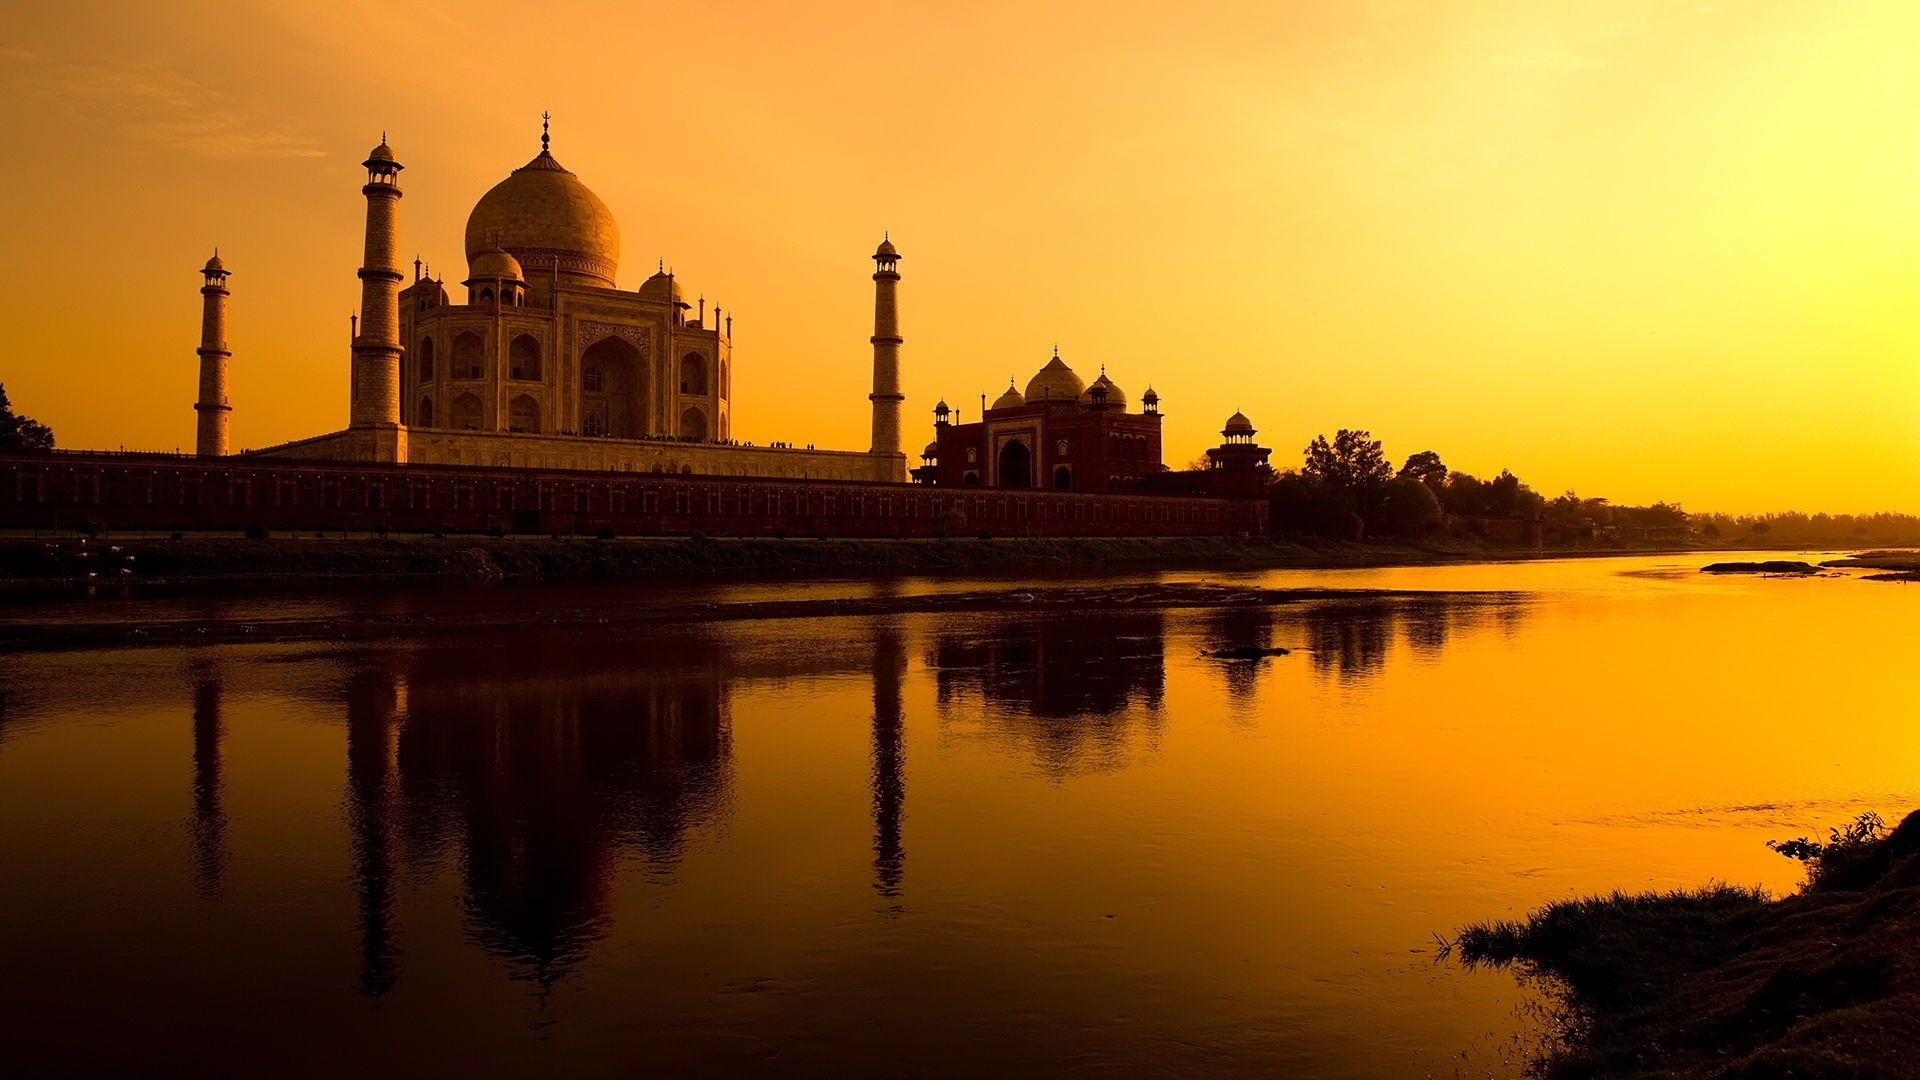 30665 скачать обои Пейзаж, Архитектура, Тадж Махал (Taj Mahal) - заставки и картинки бесплатно